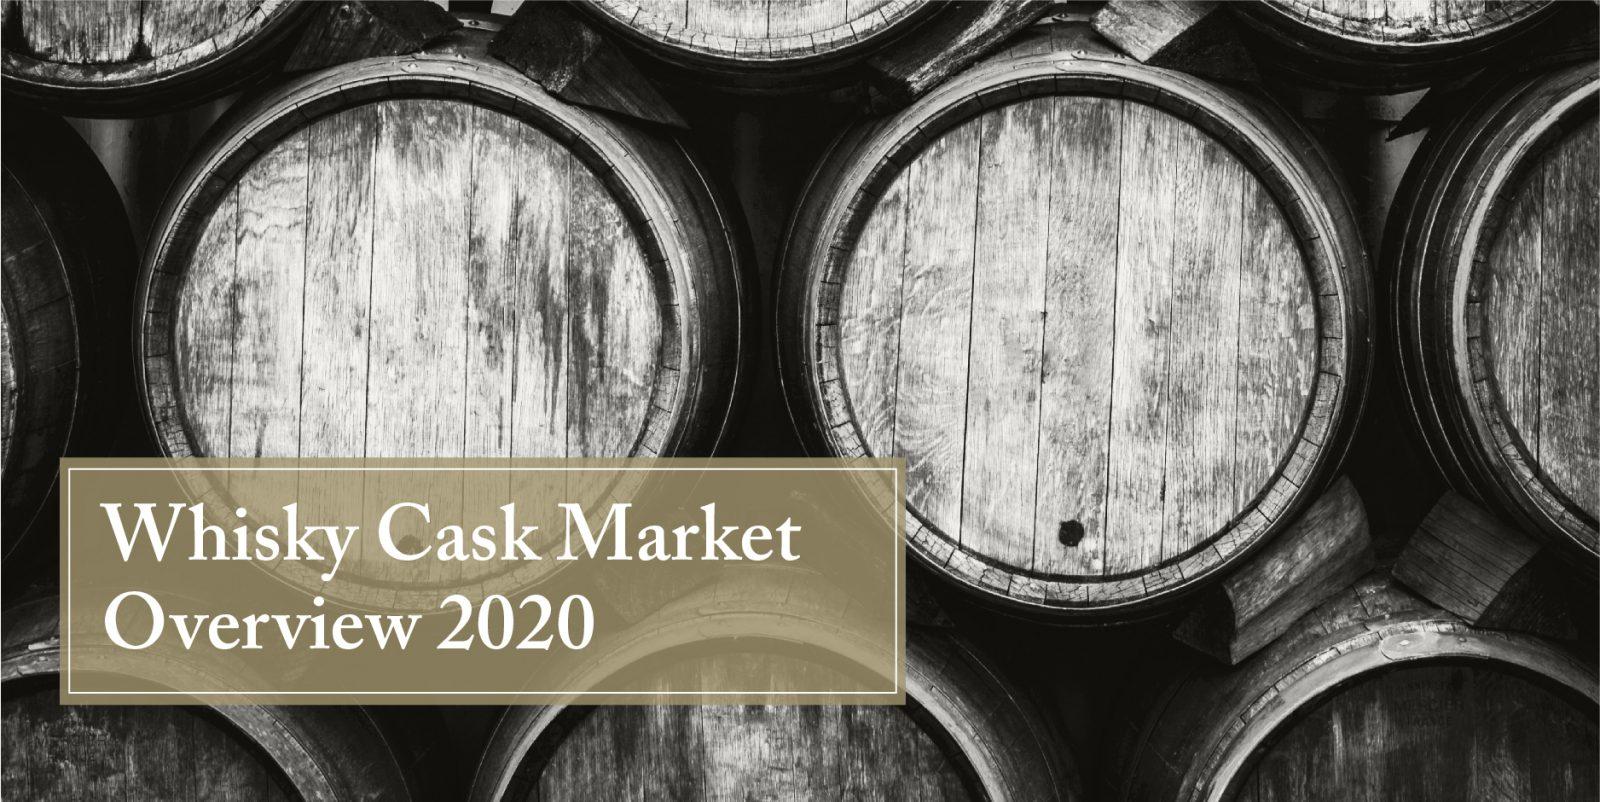 Whisky Cask Market Overview 2020